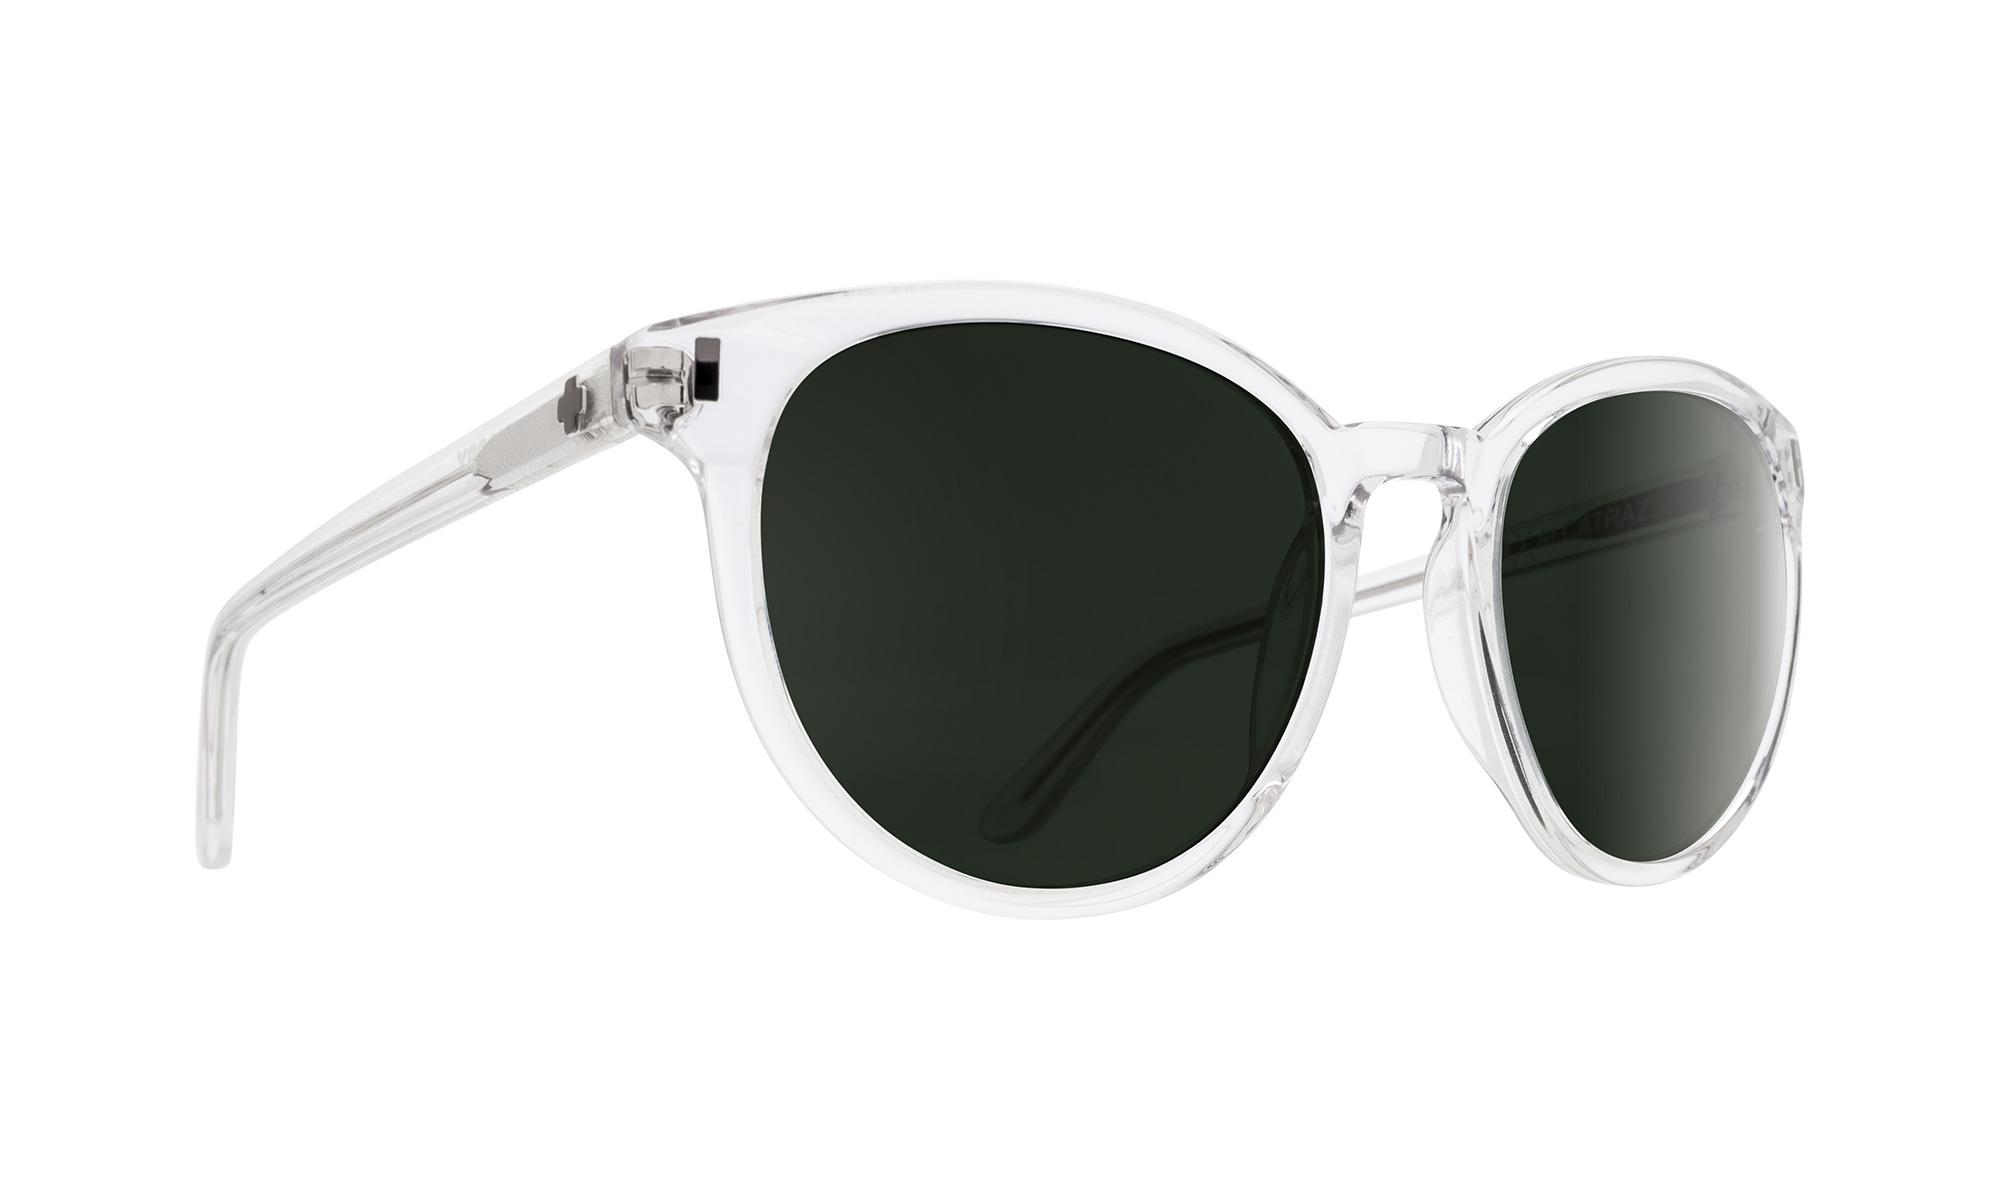 c4ee27bd72e58 Spy Optic Alcatraz Sunglasses